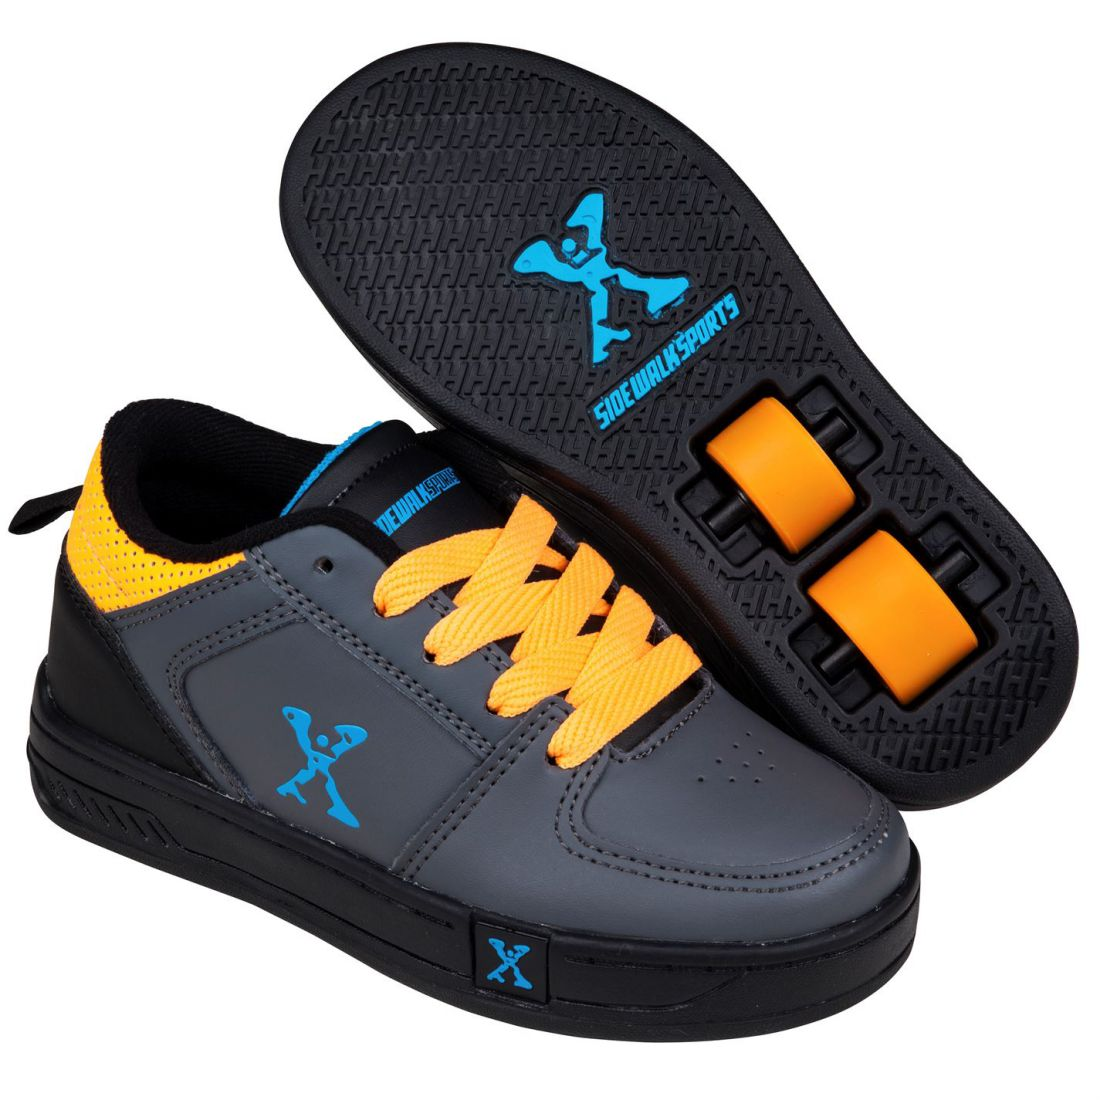 bc6cef0e1a8 Sidewalk Sport Kids Street Boys Lace Up Skate Wheeled Roller Shoes ...